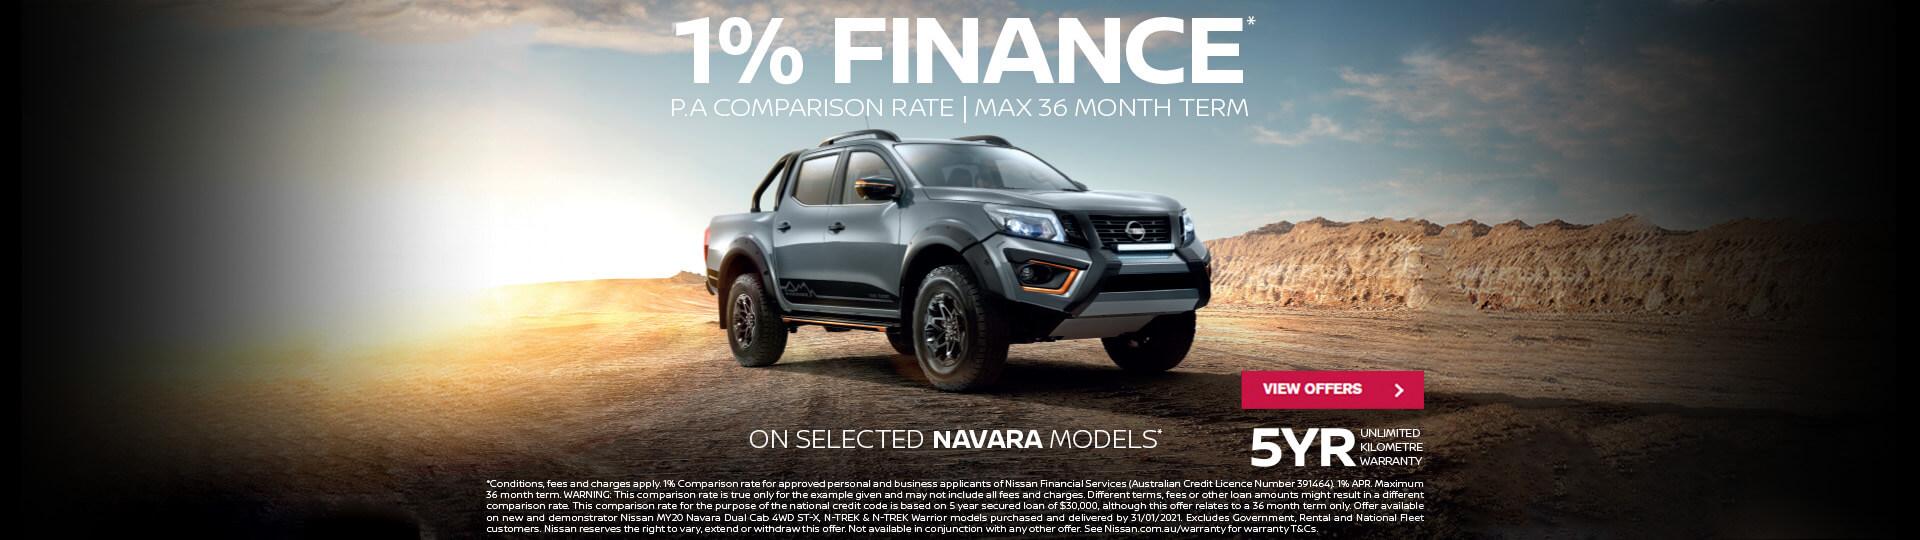 1% Finance available on selected Nissan Navara models